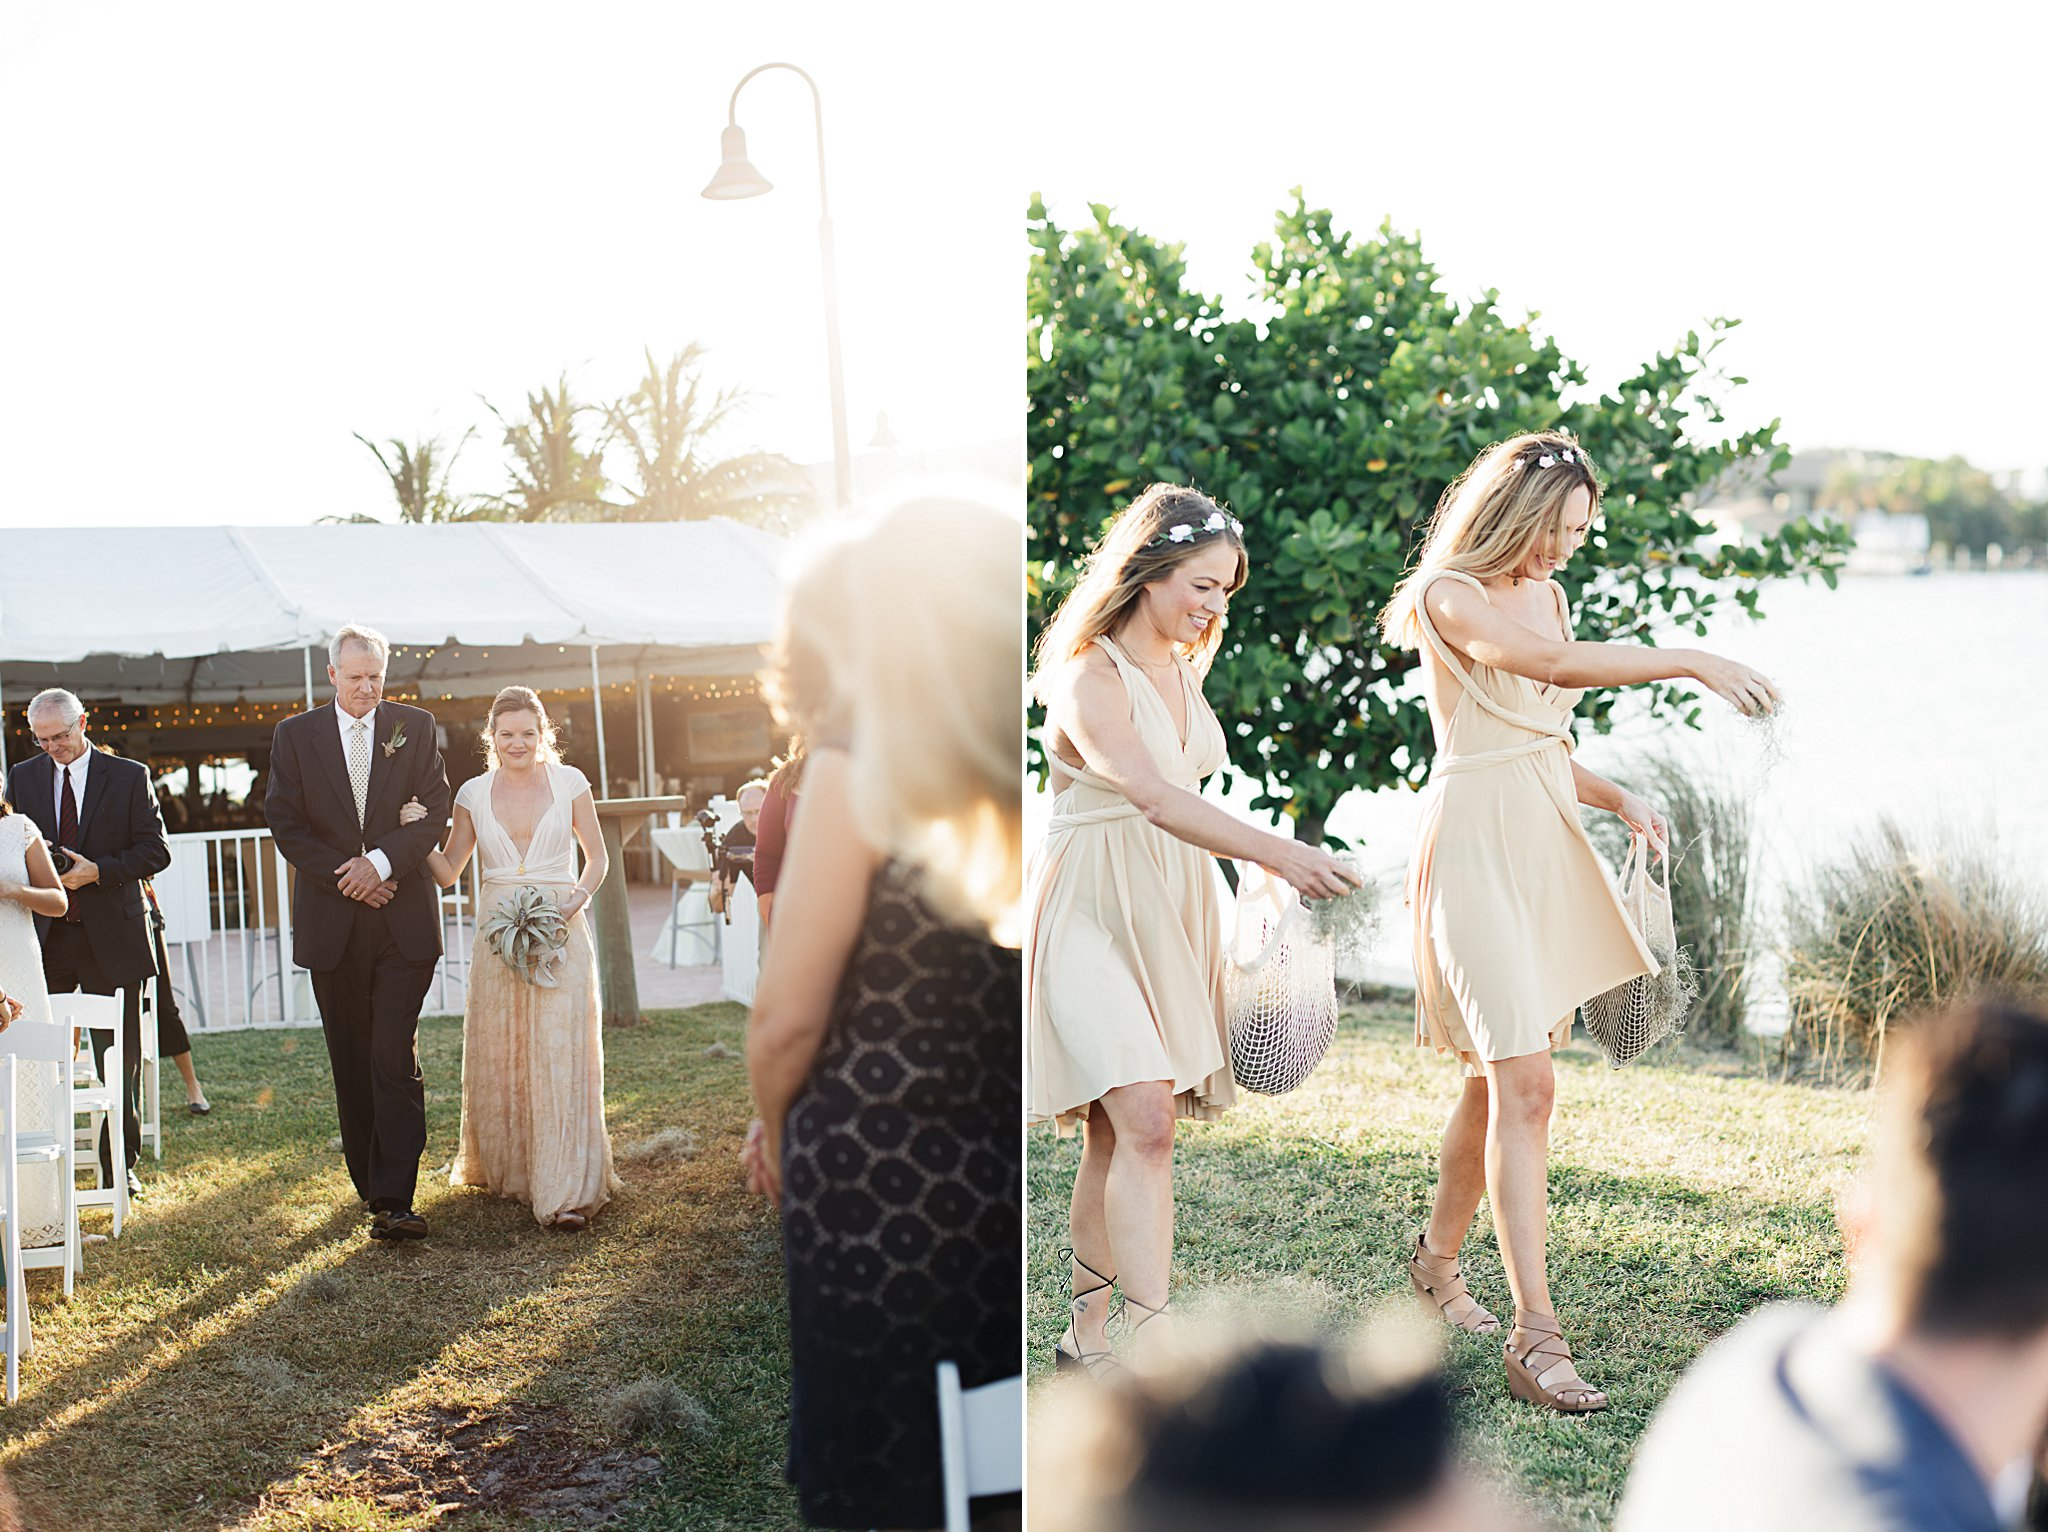 JessicaBordnerPhotography_0853.jpg